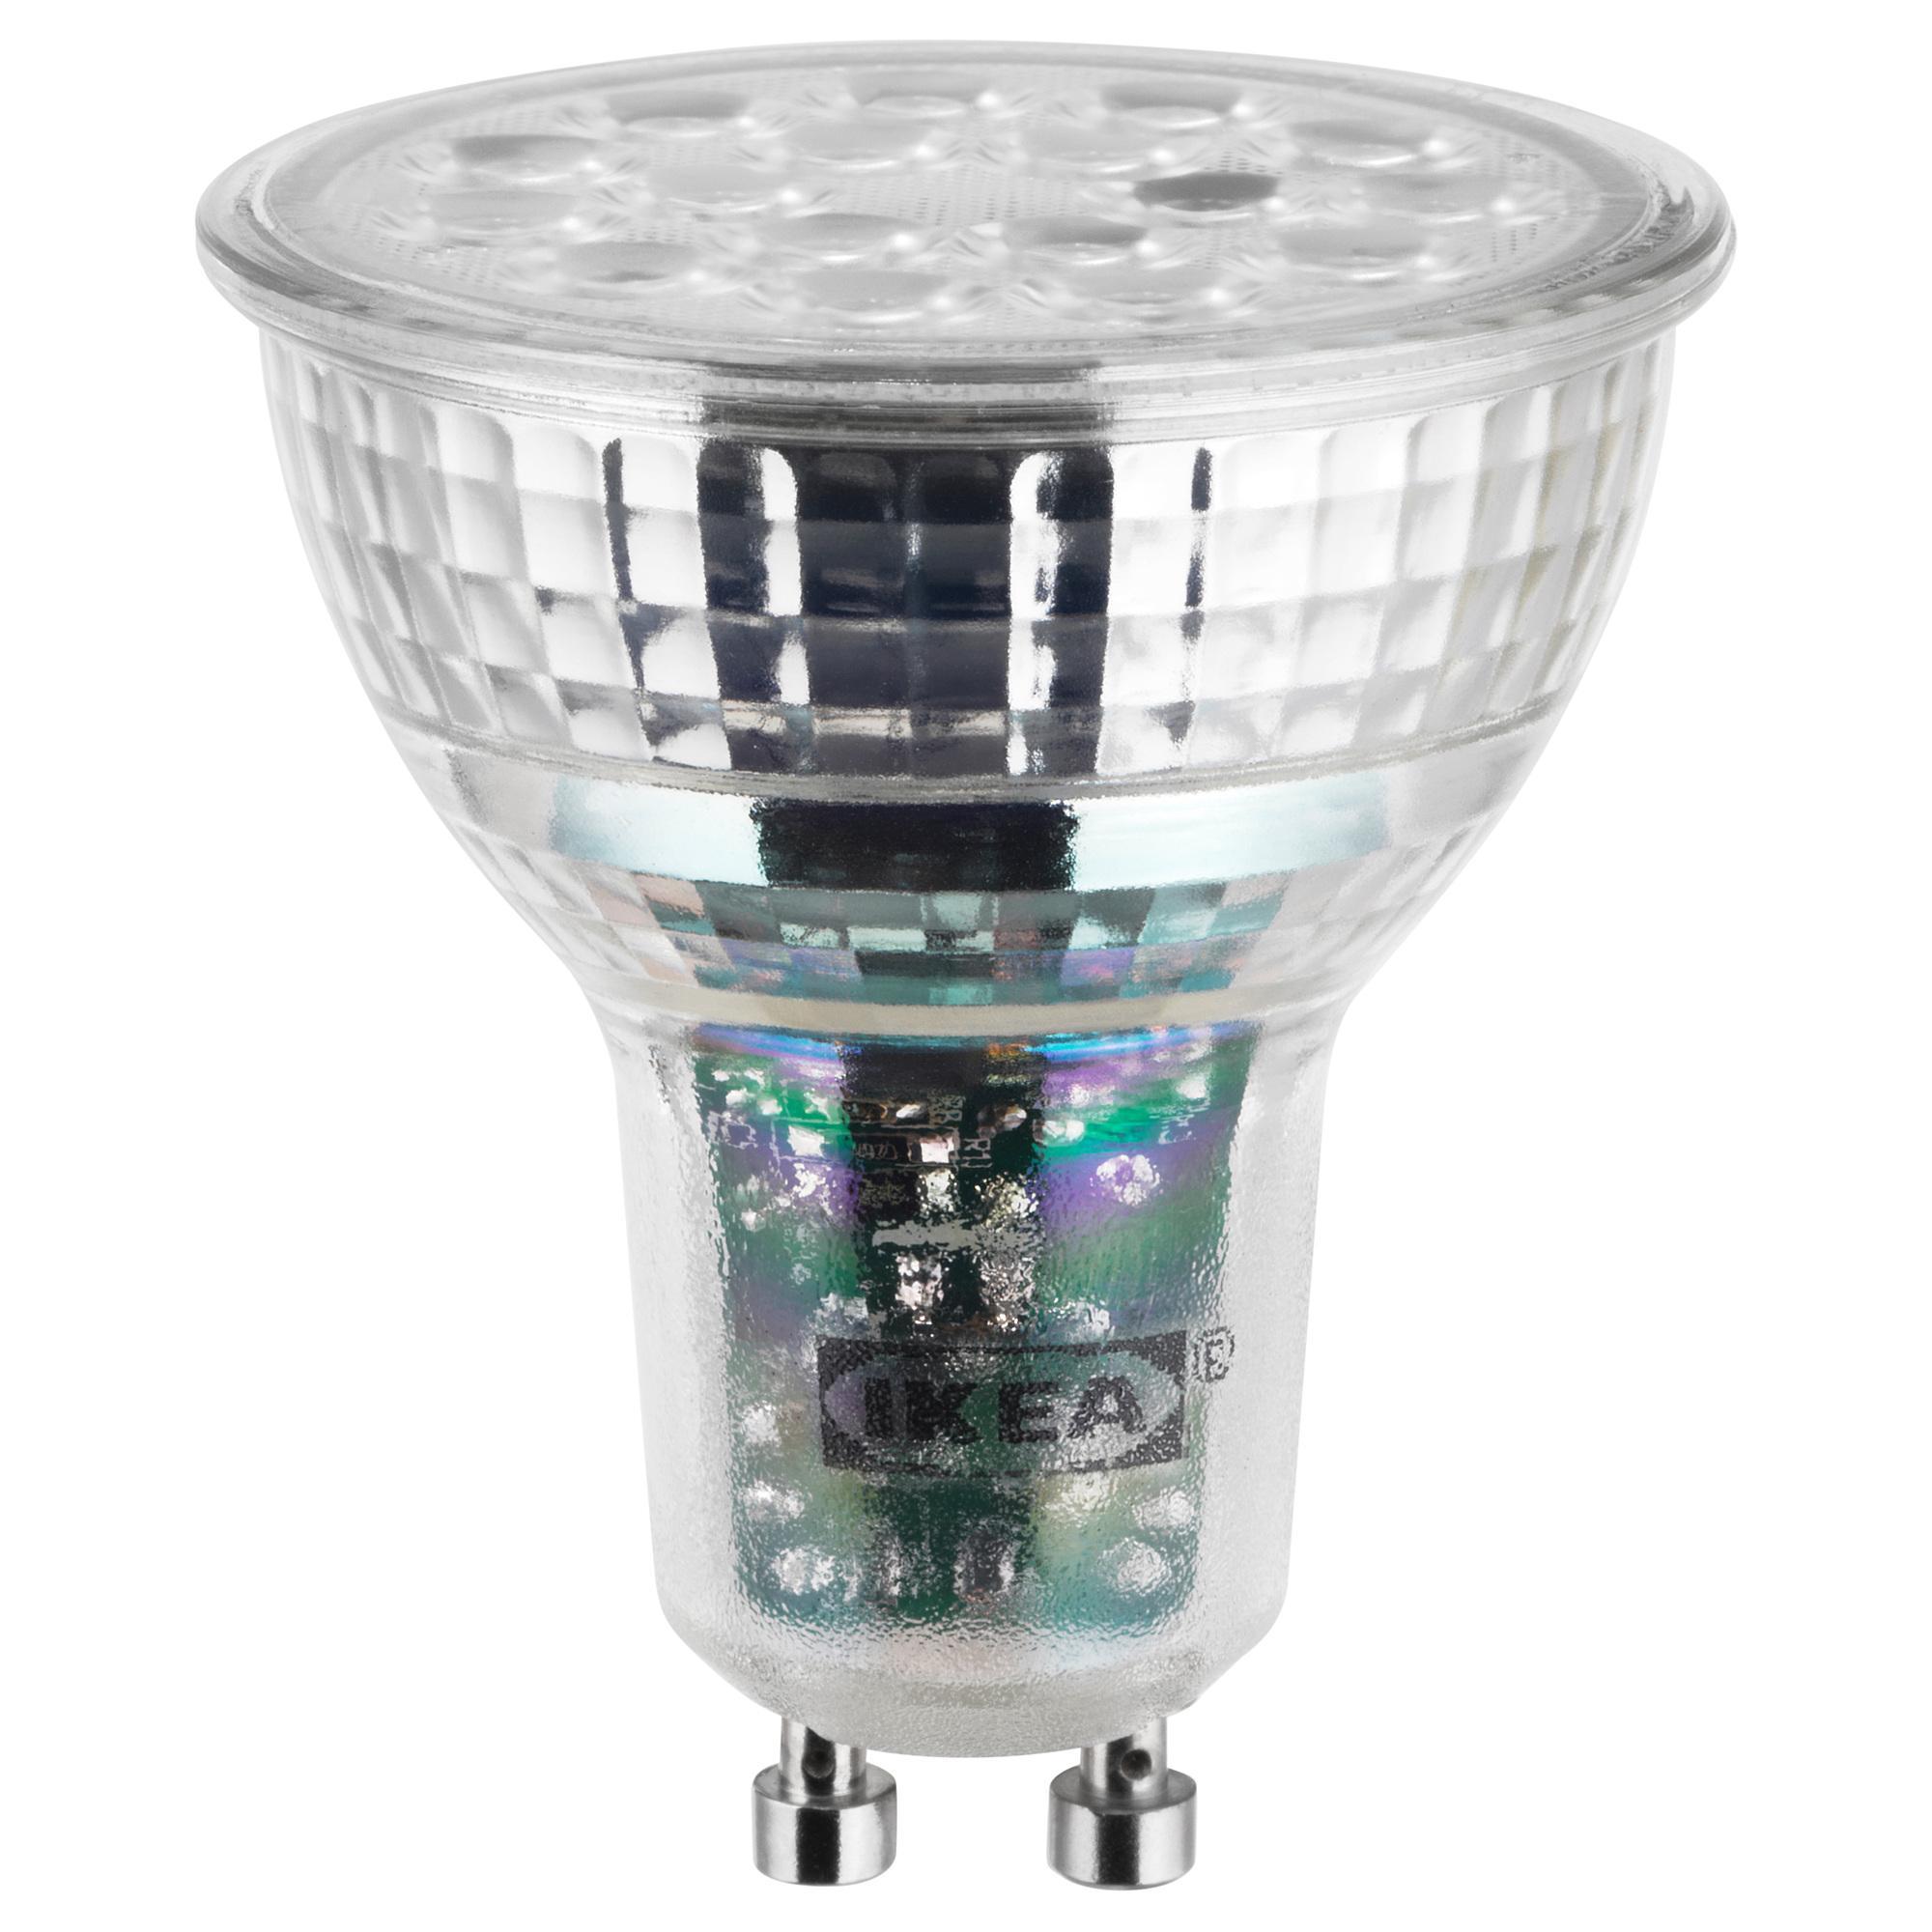 Lampe De Chevet Gu10